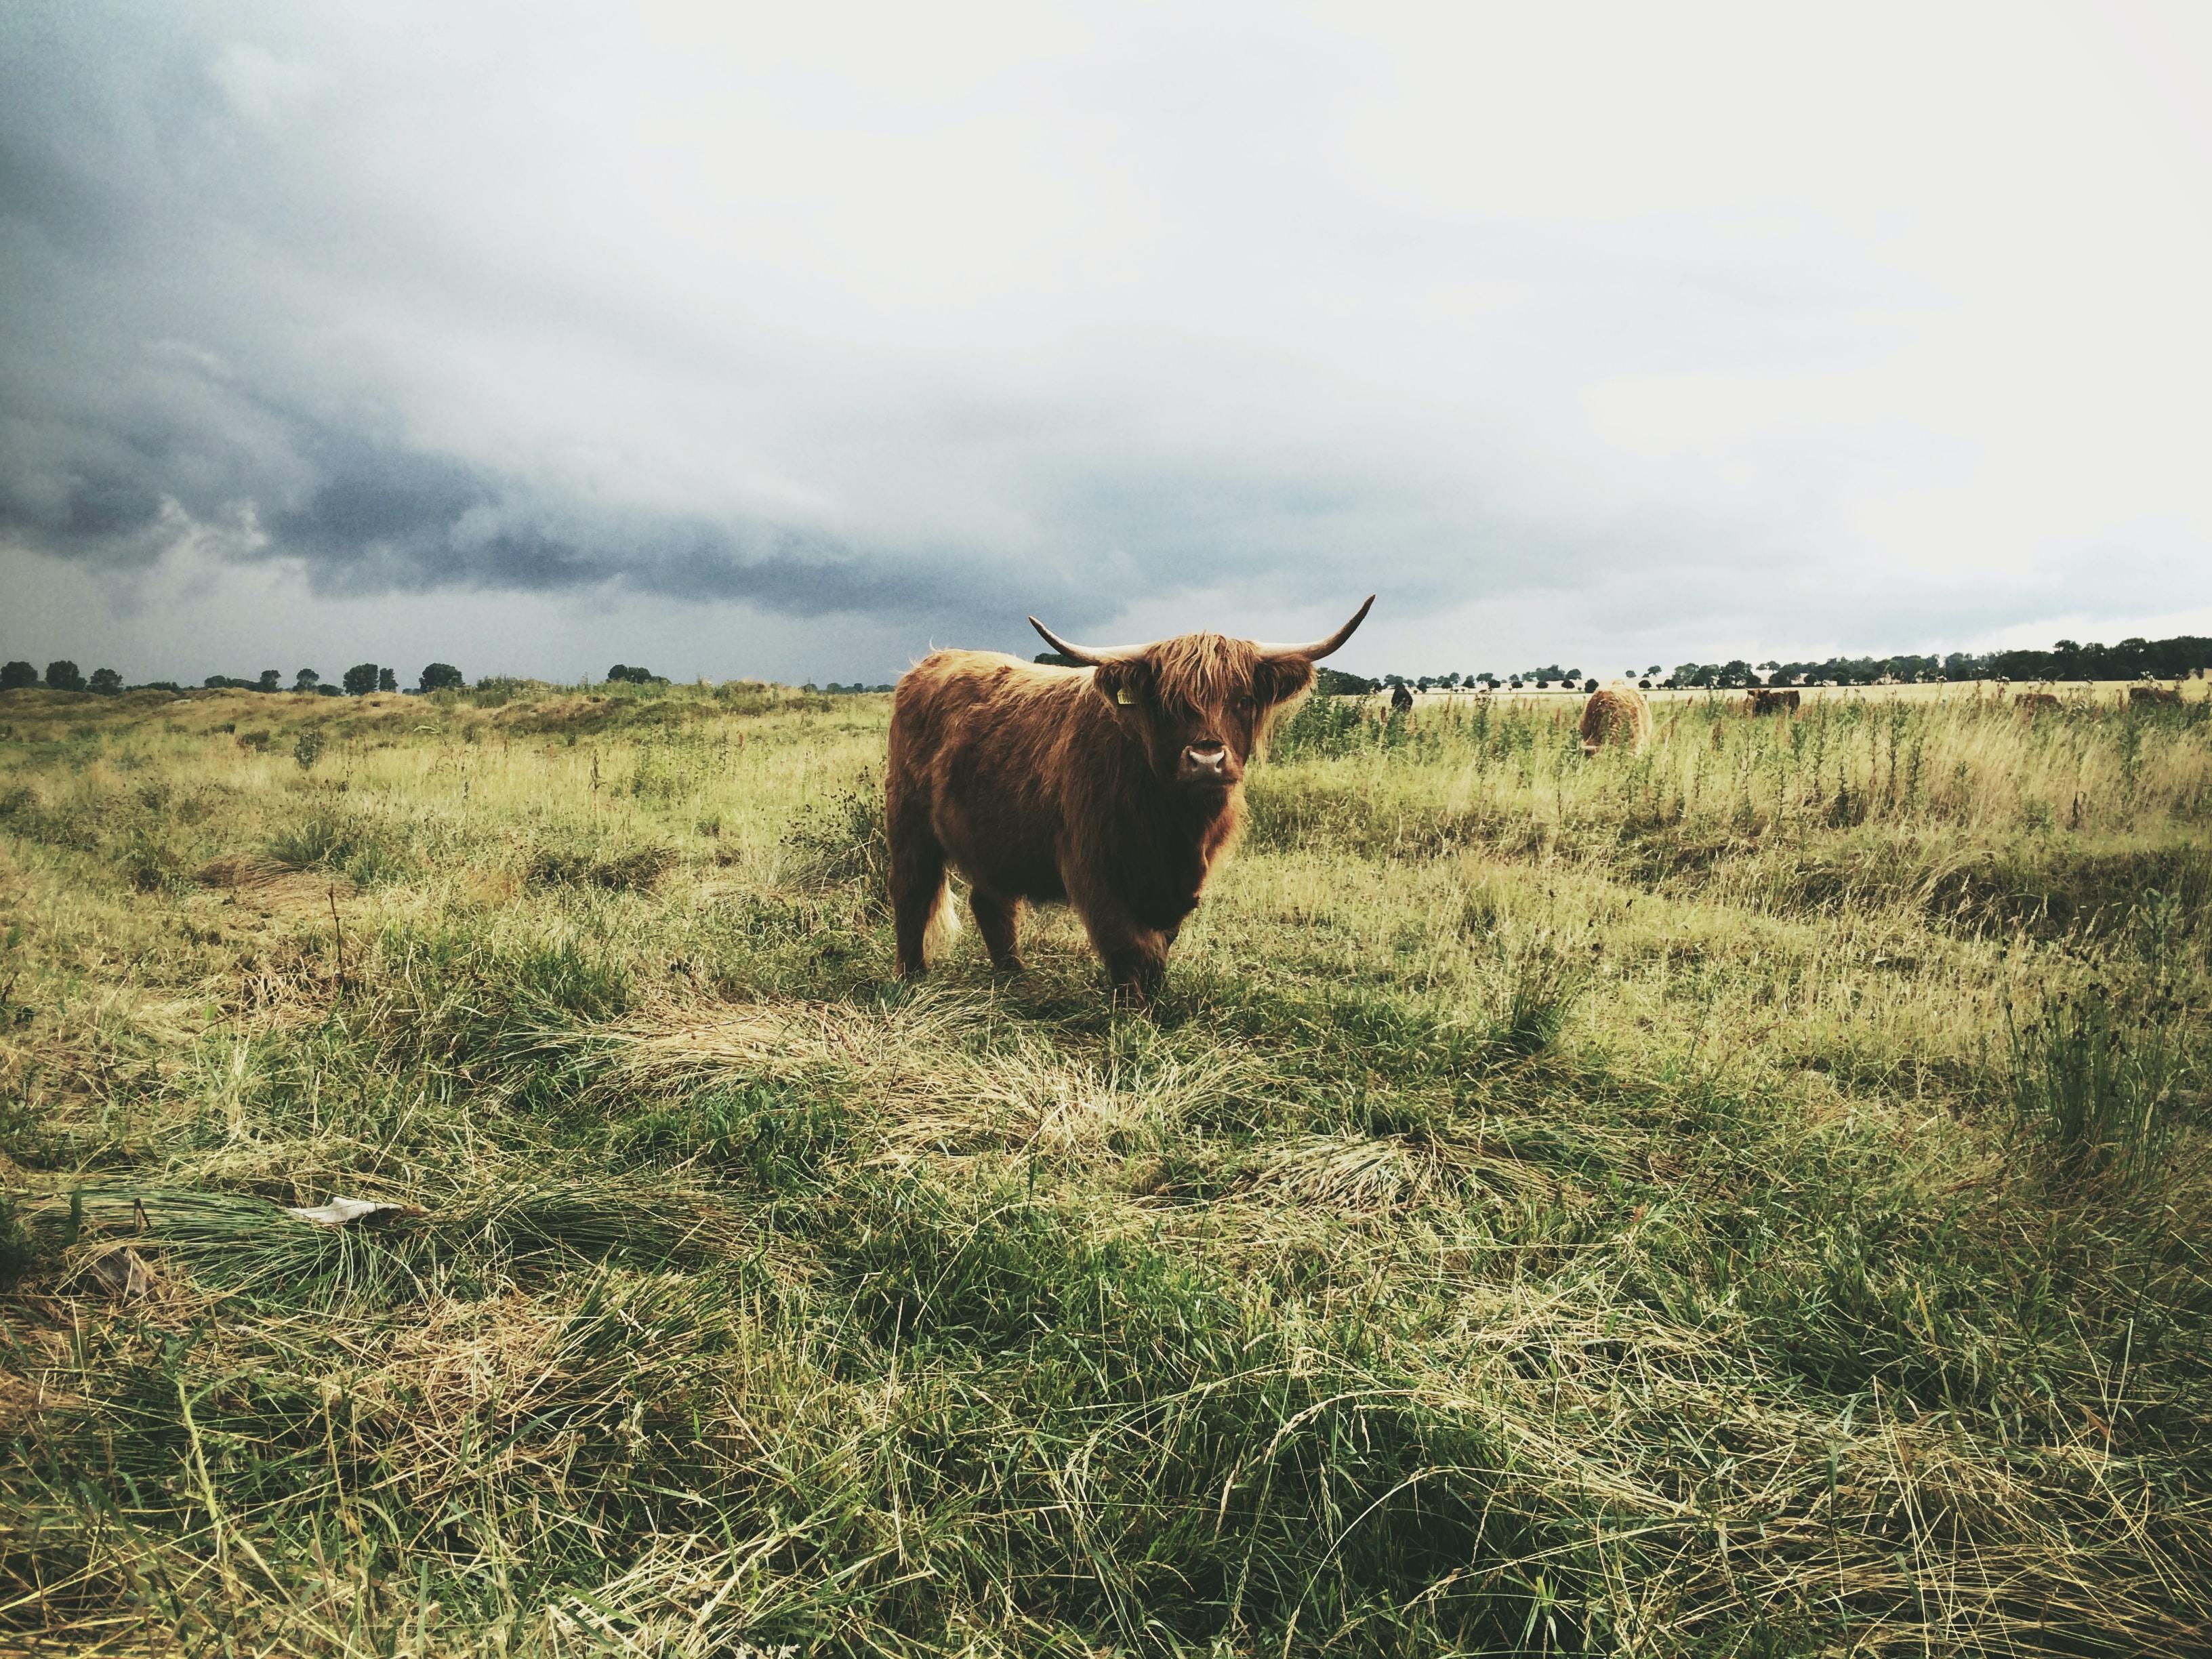 highland cattle standing on grass field